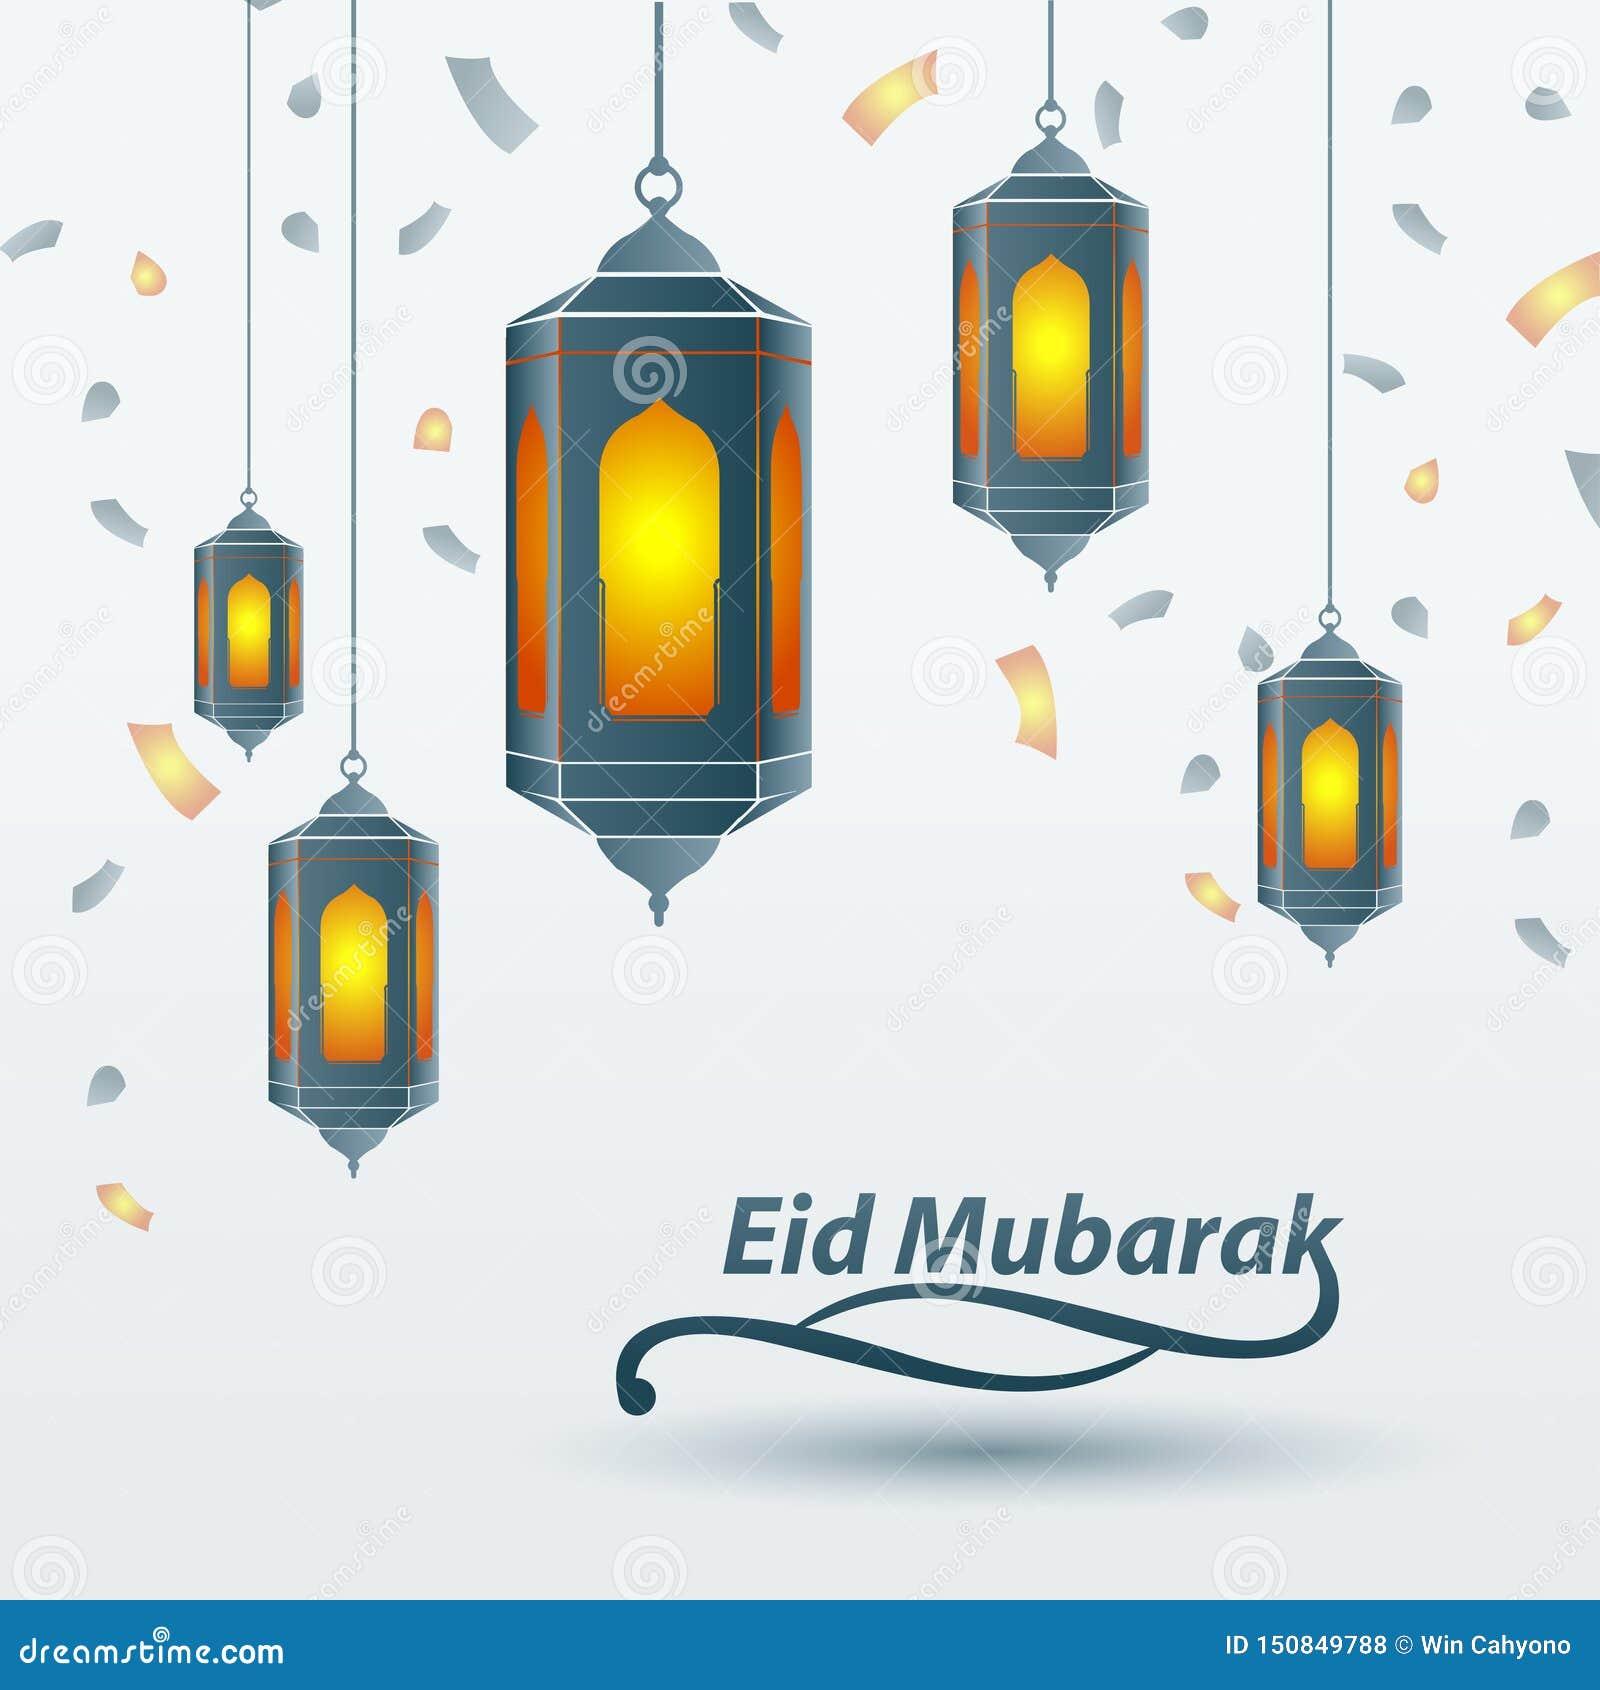 eid lantern template  Eid Mubarak Islamic Design Traditional Lantern, Template ...